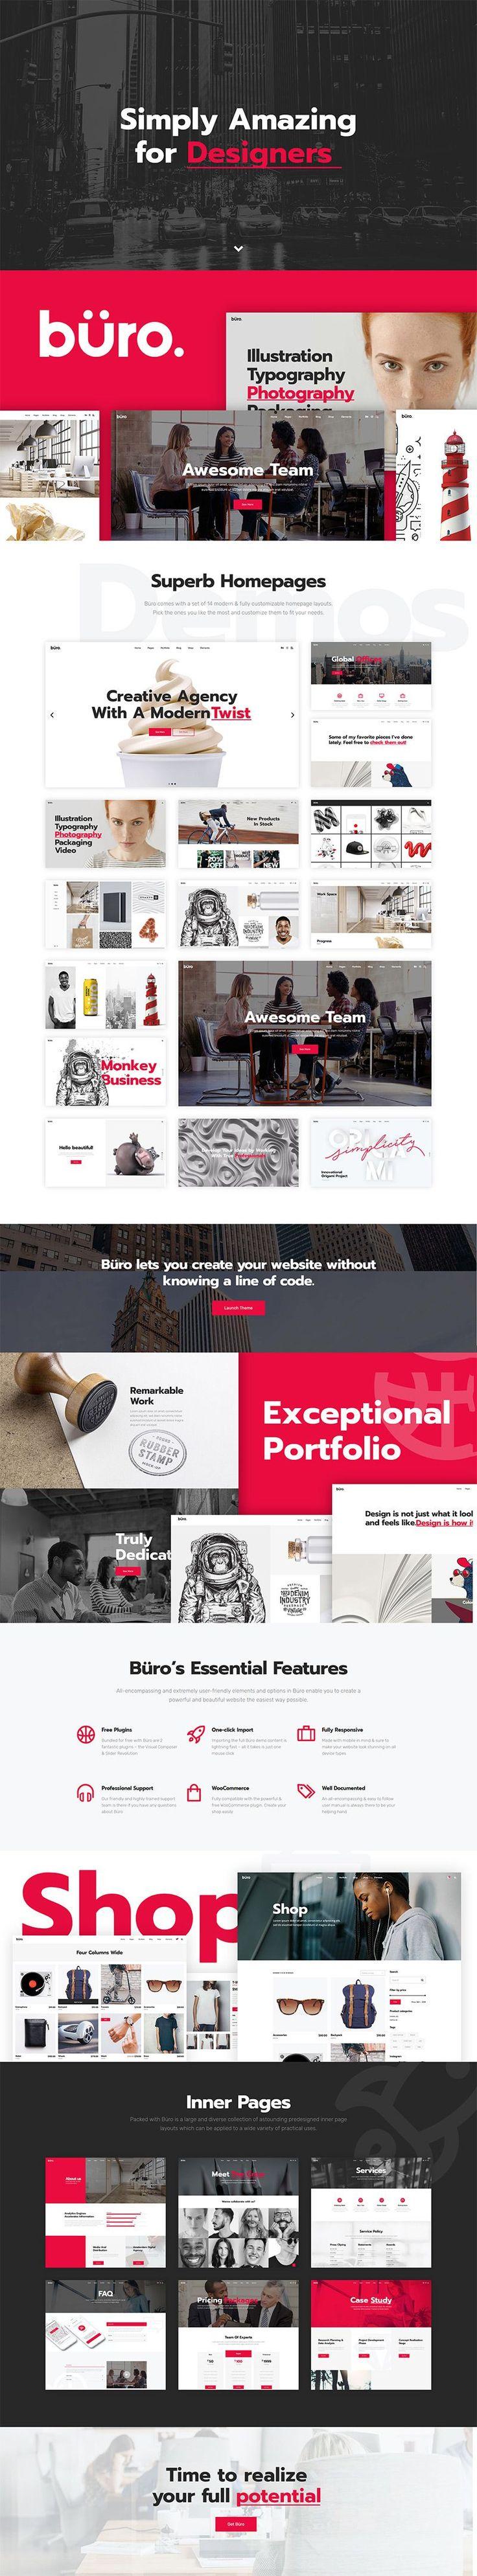 Büro Creative Agency and Freelancer Theme Web design